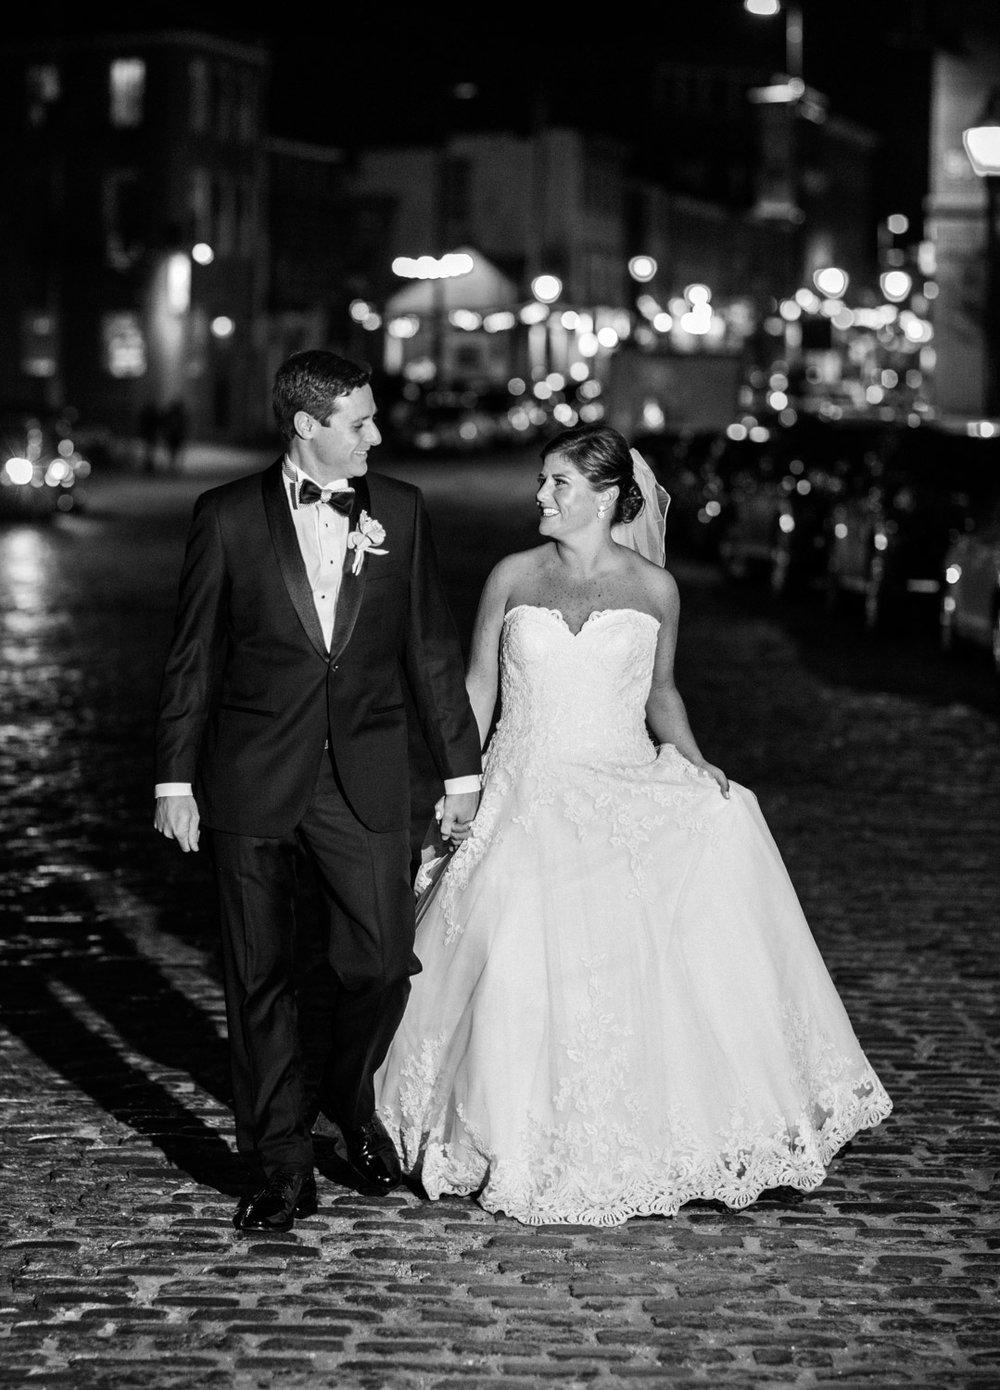 new_years_eve_wedding_026.jpg